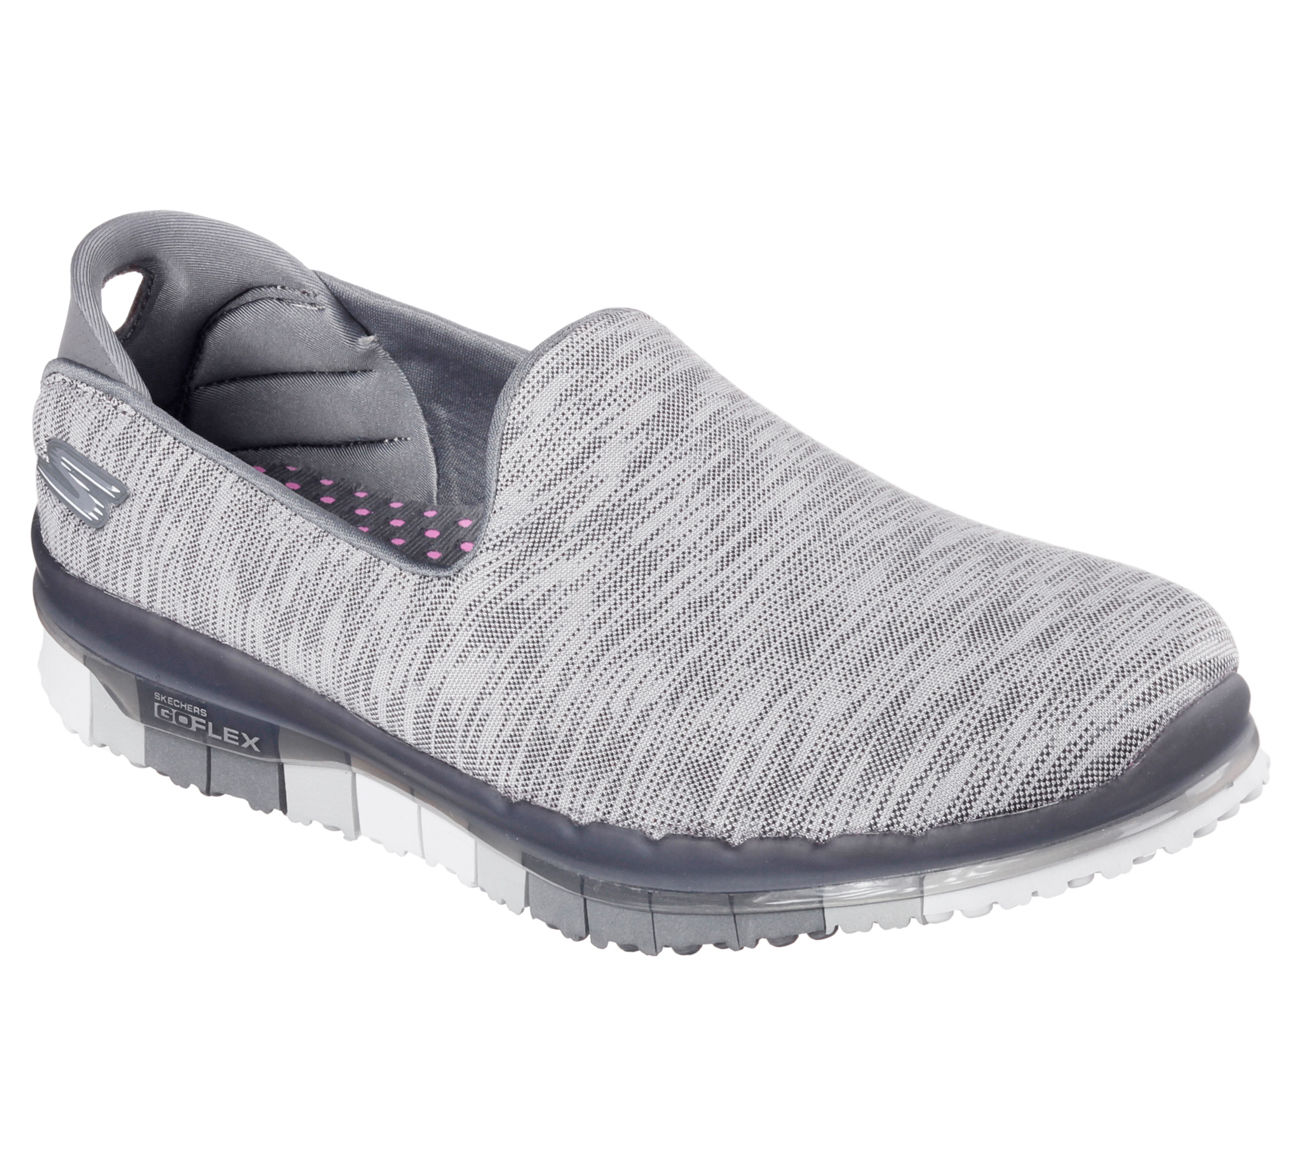 skechers 14015 char women 39 s go flex walk ability walking ebay. Black Bedroom Furniture Sets. Home Design Ideas